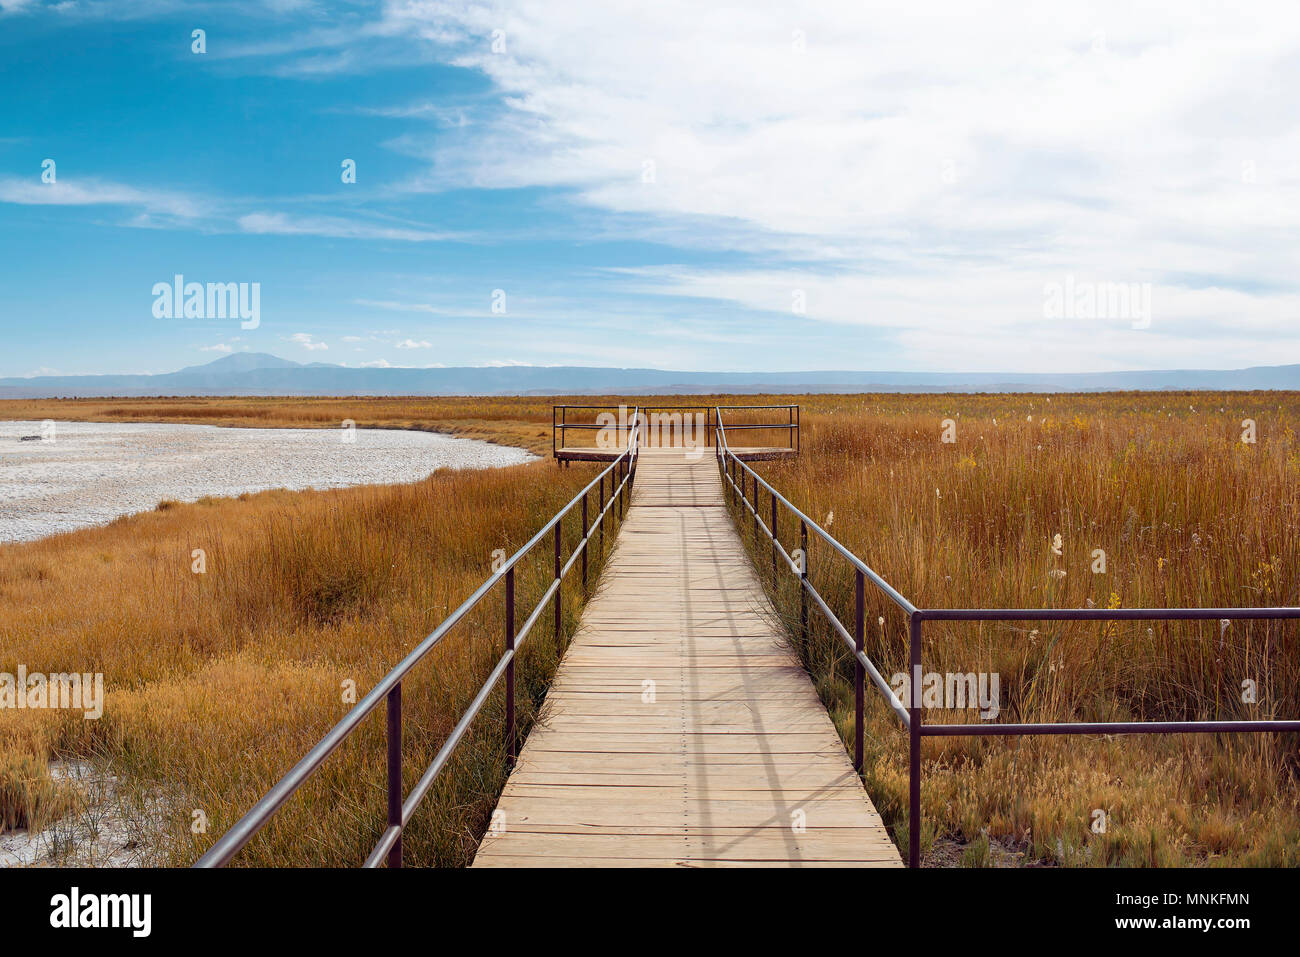 Minimalist landscape (walkway for visitors) by Laguna Cejar, Chile - Stock Image